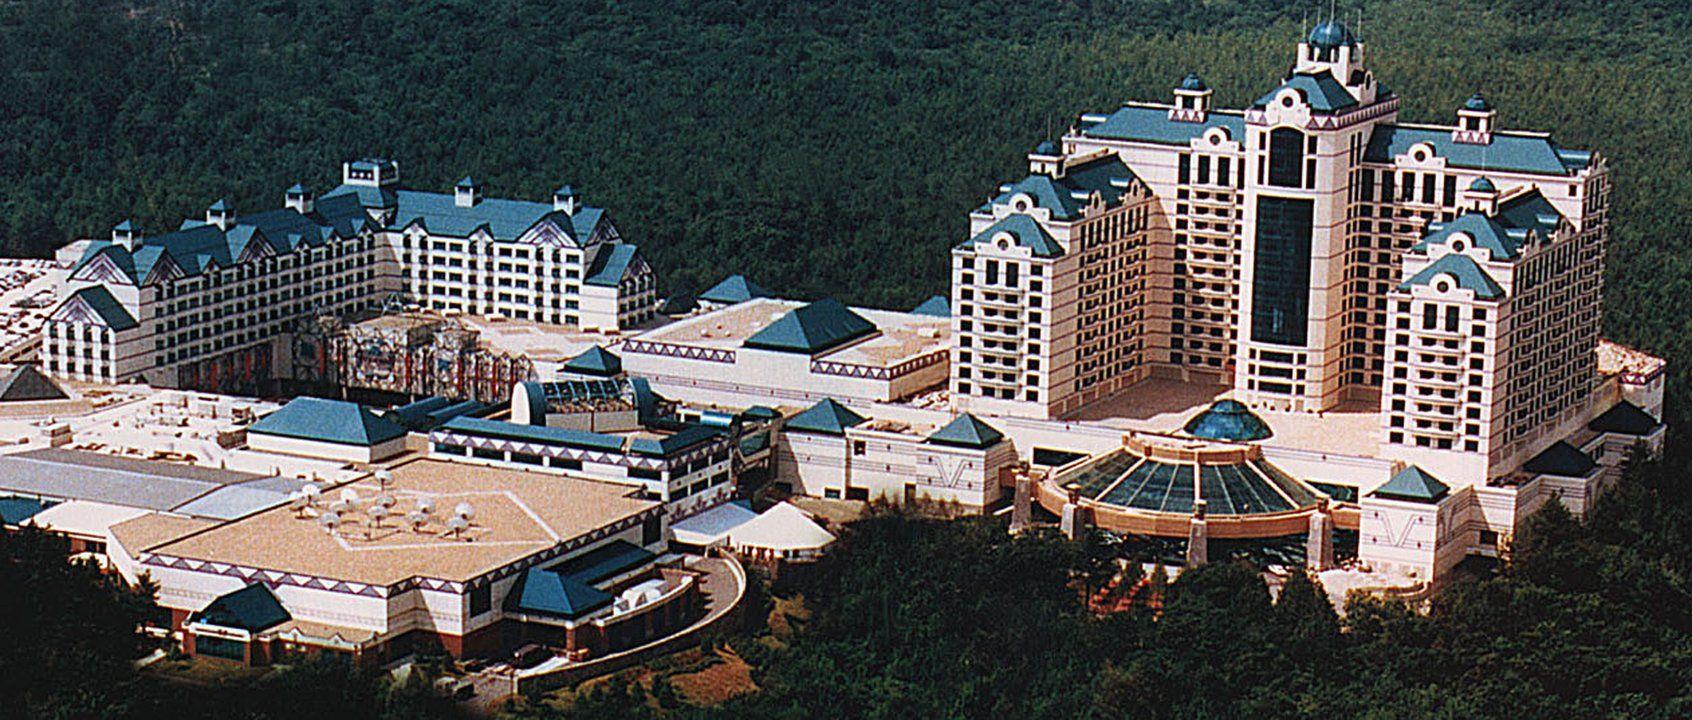 Foxwoods casino packages layoffs mohegan sun casino